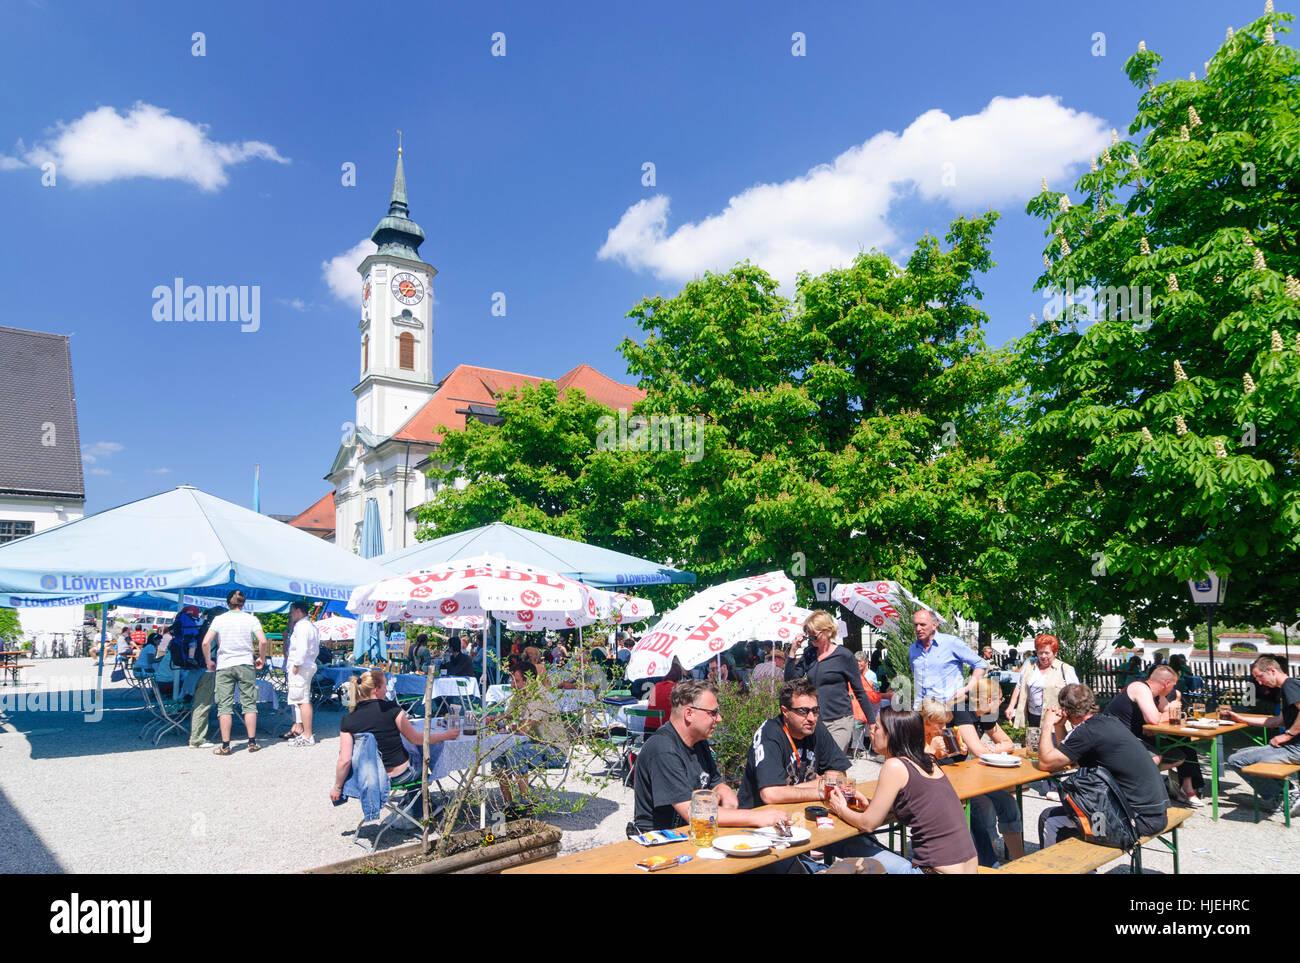 Schäftlarn: Schäftlarn Monastery, Oberbayern, Upper Bavaria, Bayern, Bavaria, Germany - Stock Image